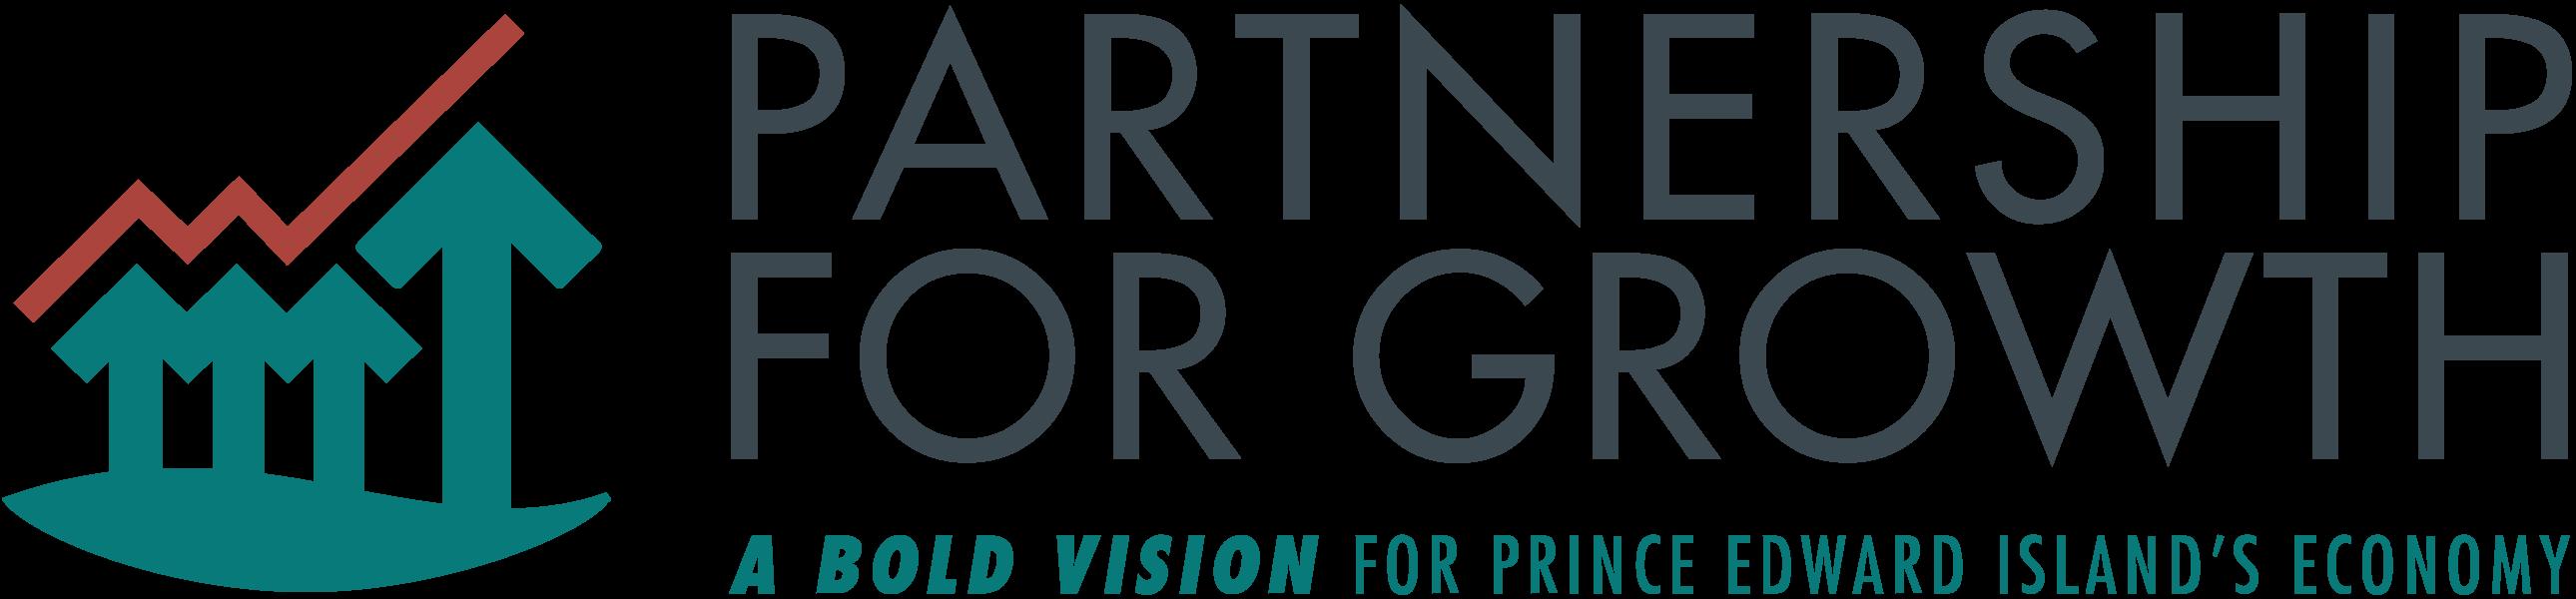 PEI Partnership for Growth